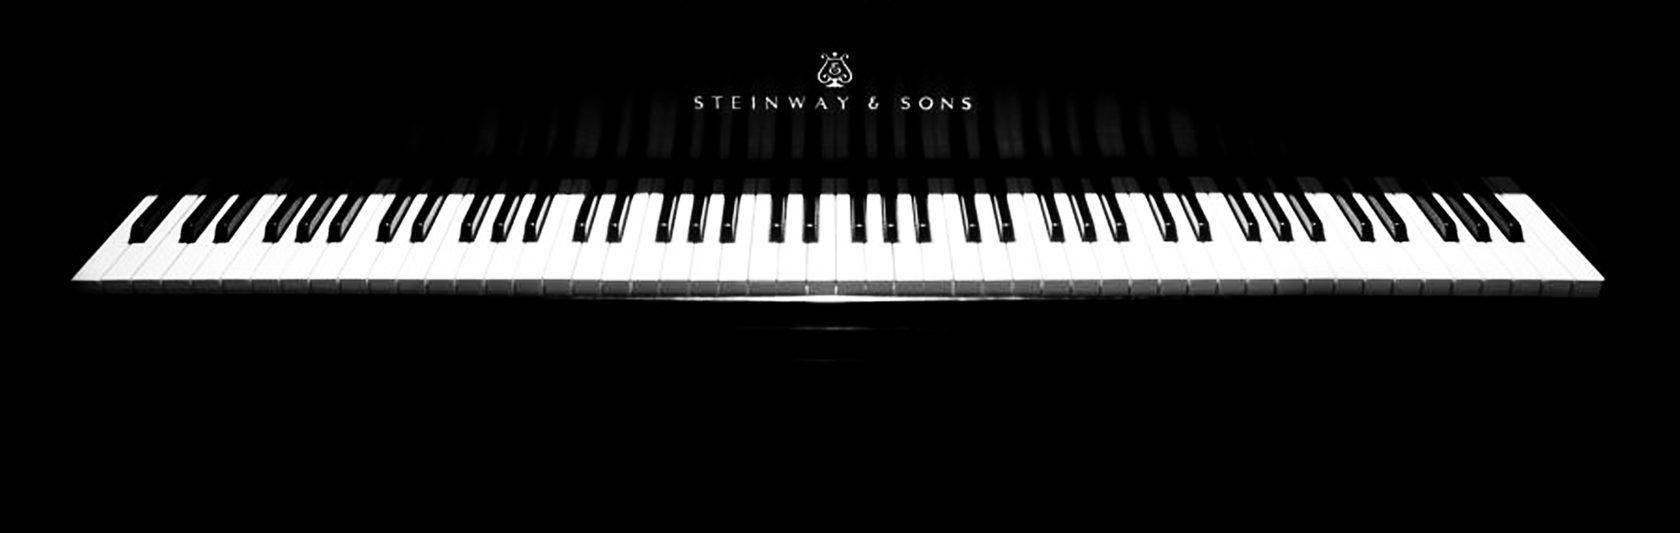 cropped-steinway-keyboard-1680.jpg